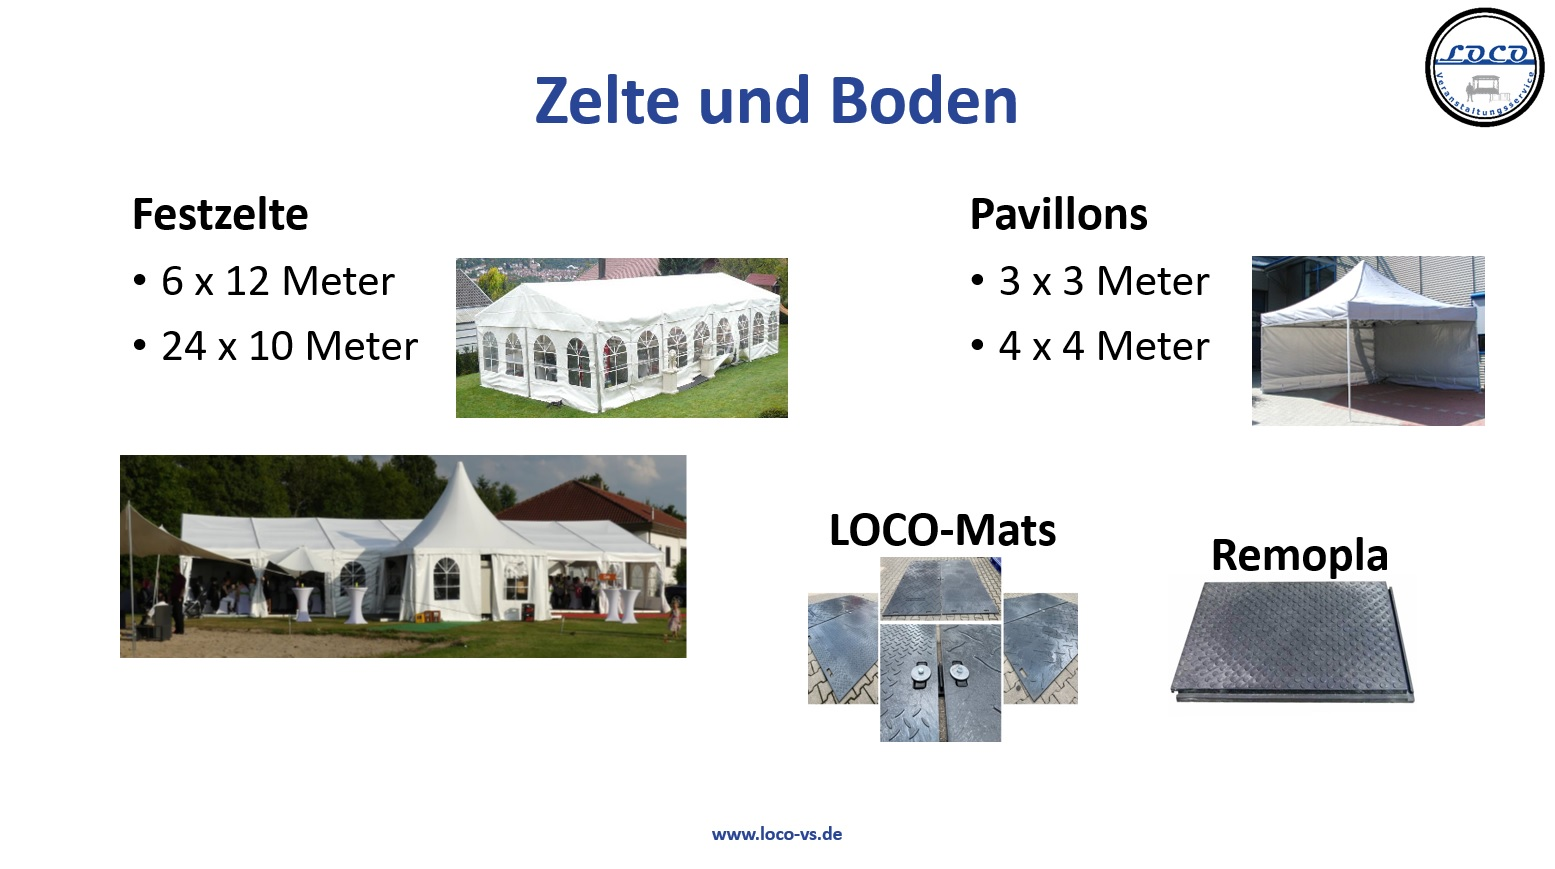 Zelte Festzelt Pavillons Remopla Bodenschutz